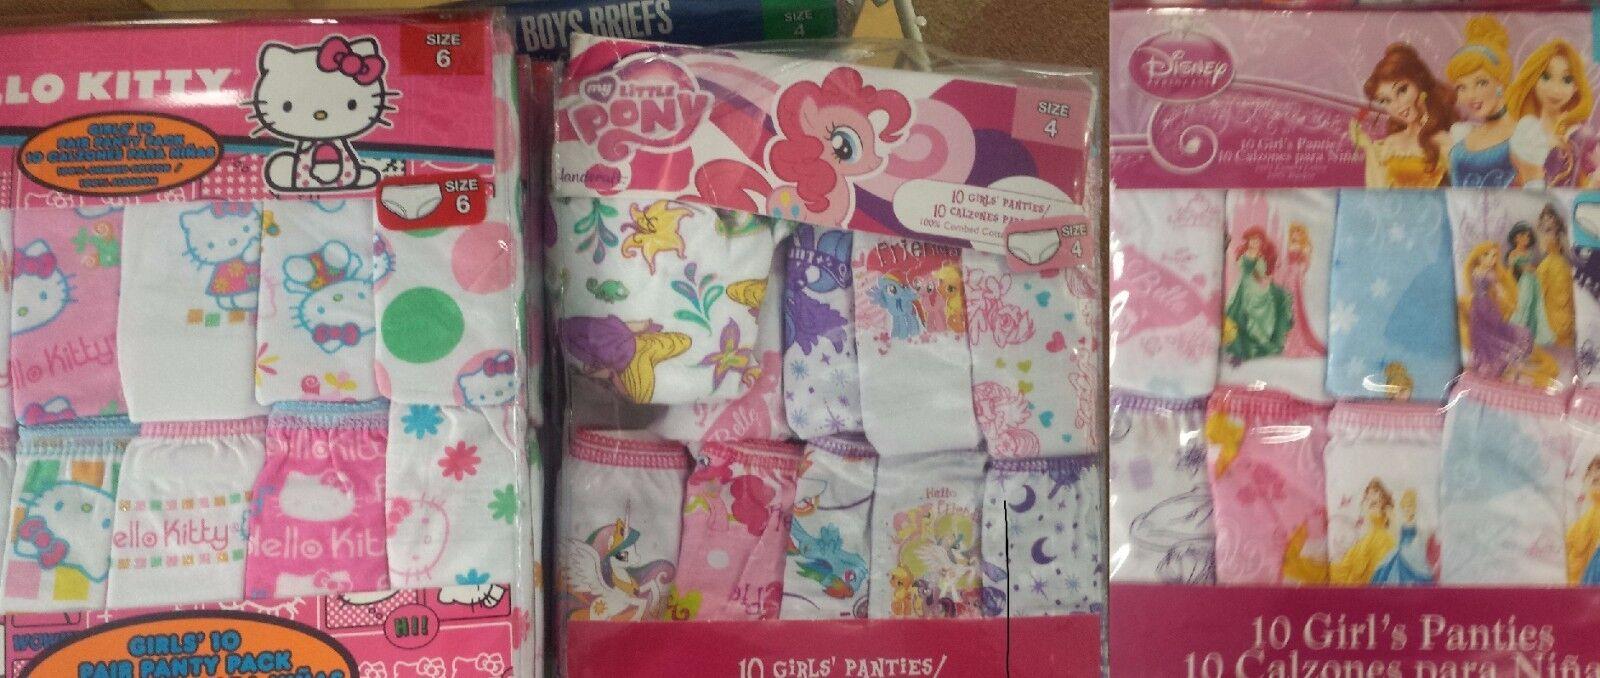 Hello Kitty Disney Princess My Little Pony 10 Girls Underwea